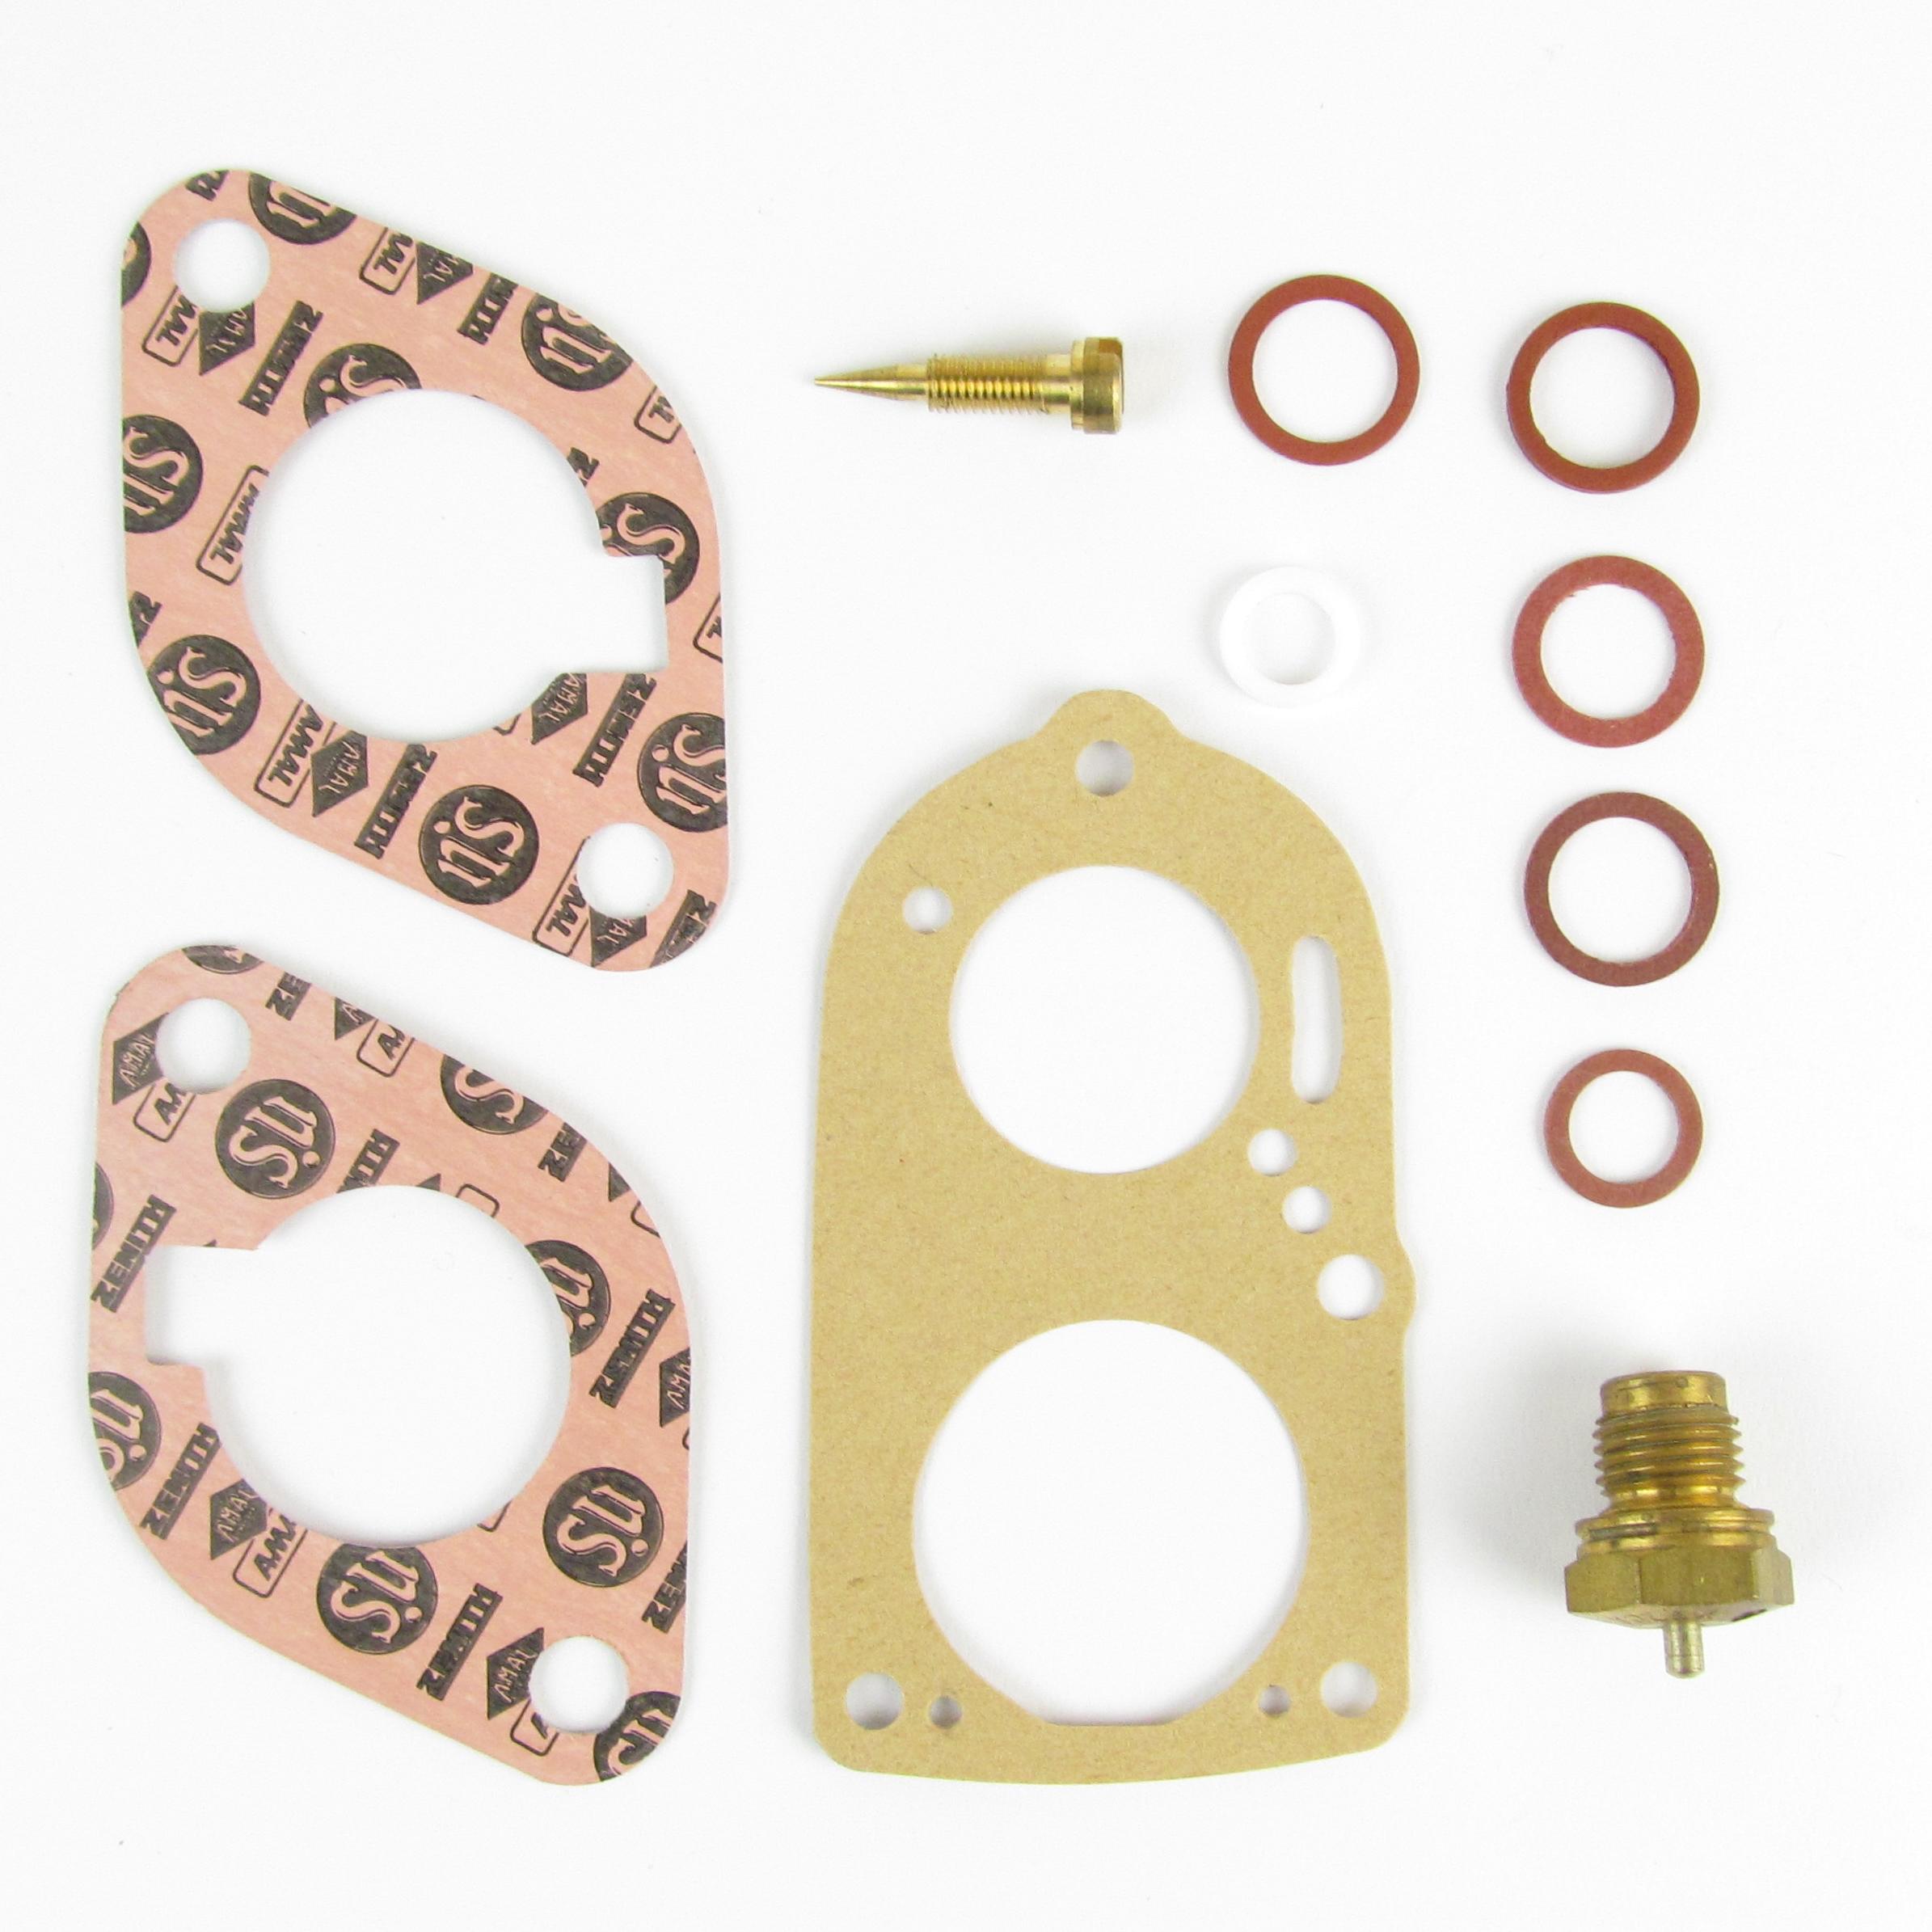 SOLEX B26 ZIC CARB SERVICE / REPAIR / GASKET / REBUILD KIT FORD ANGLIA 100E ETC ..